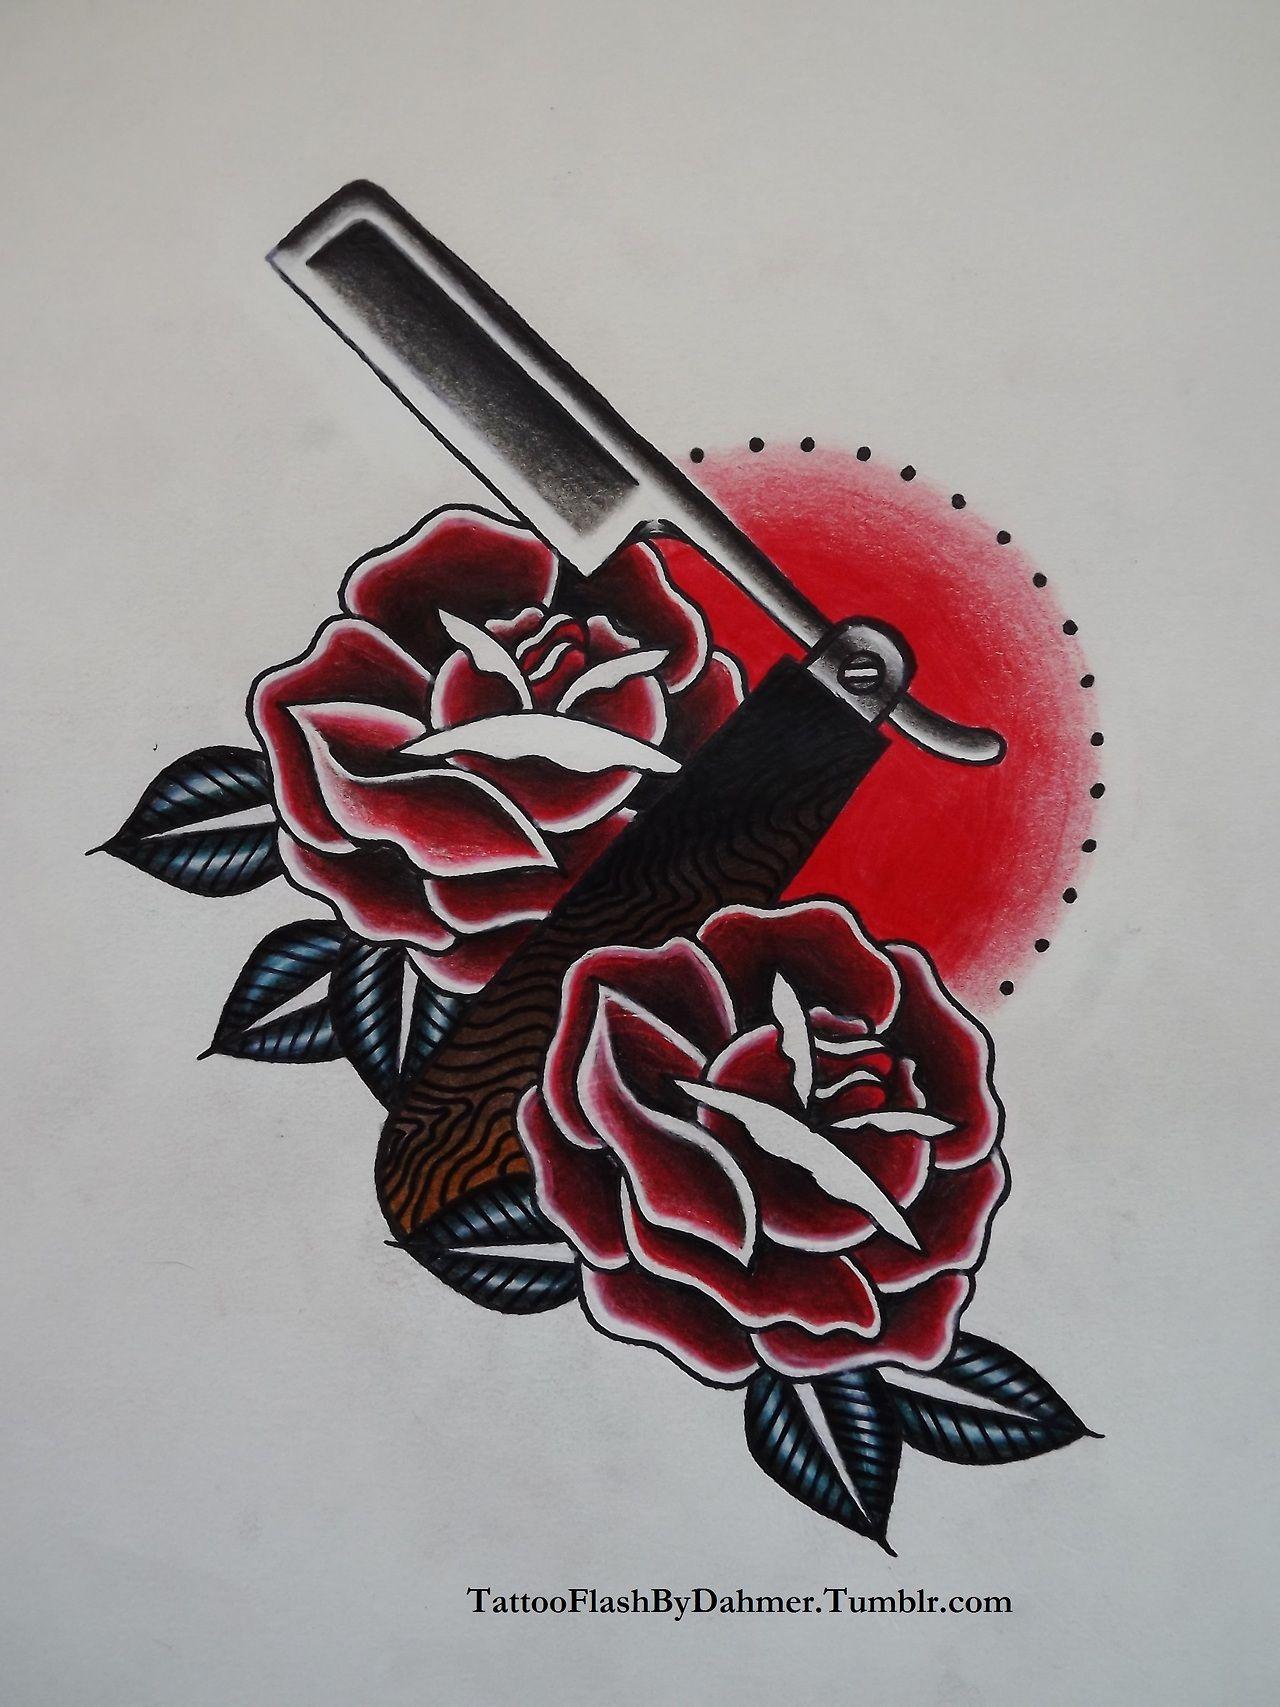 razor rose traditional tattoo flash tattoos pinterest traditional tattoo flash. Black Bedroom Furniture Sets. Home Design Ideas